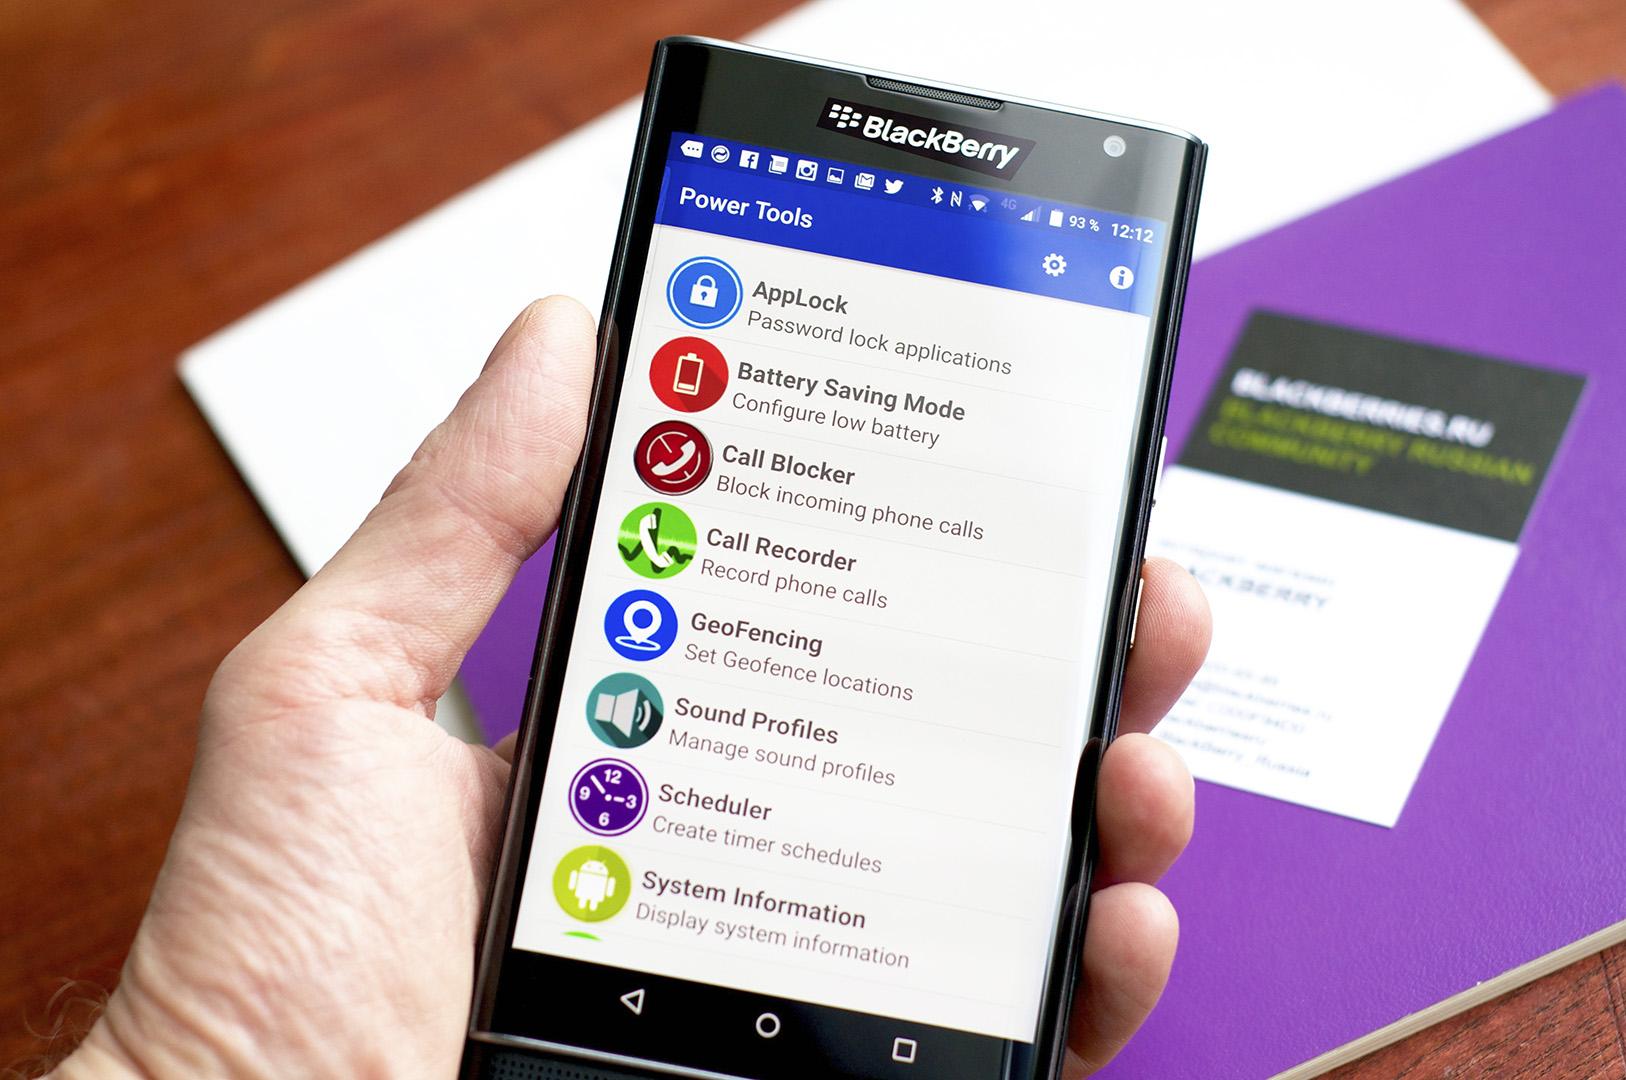 BlackBerry-Priv-PowerTools